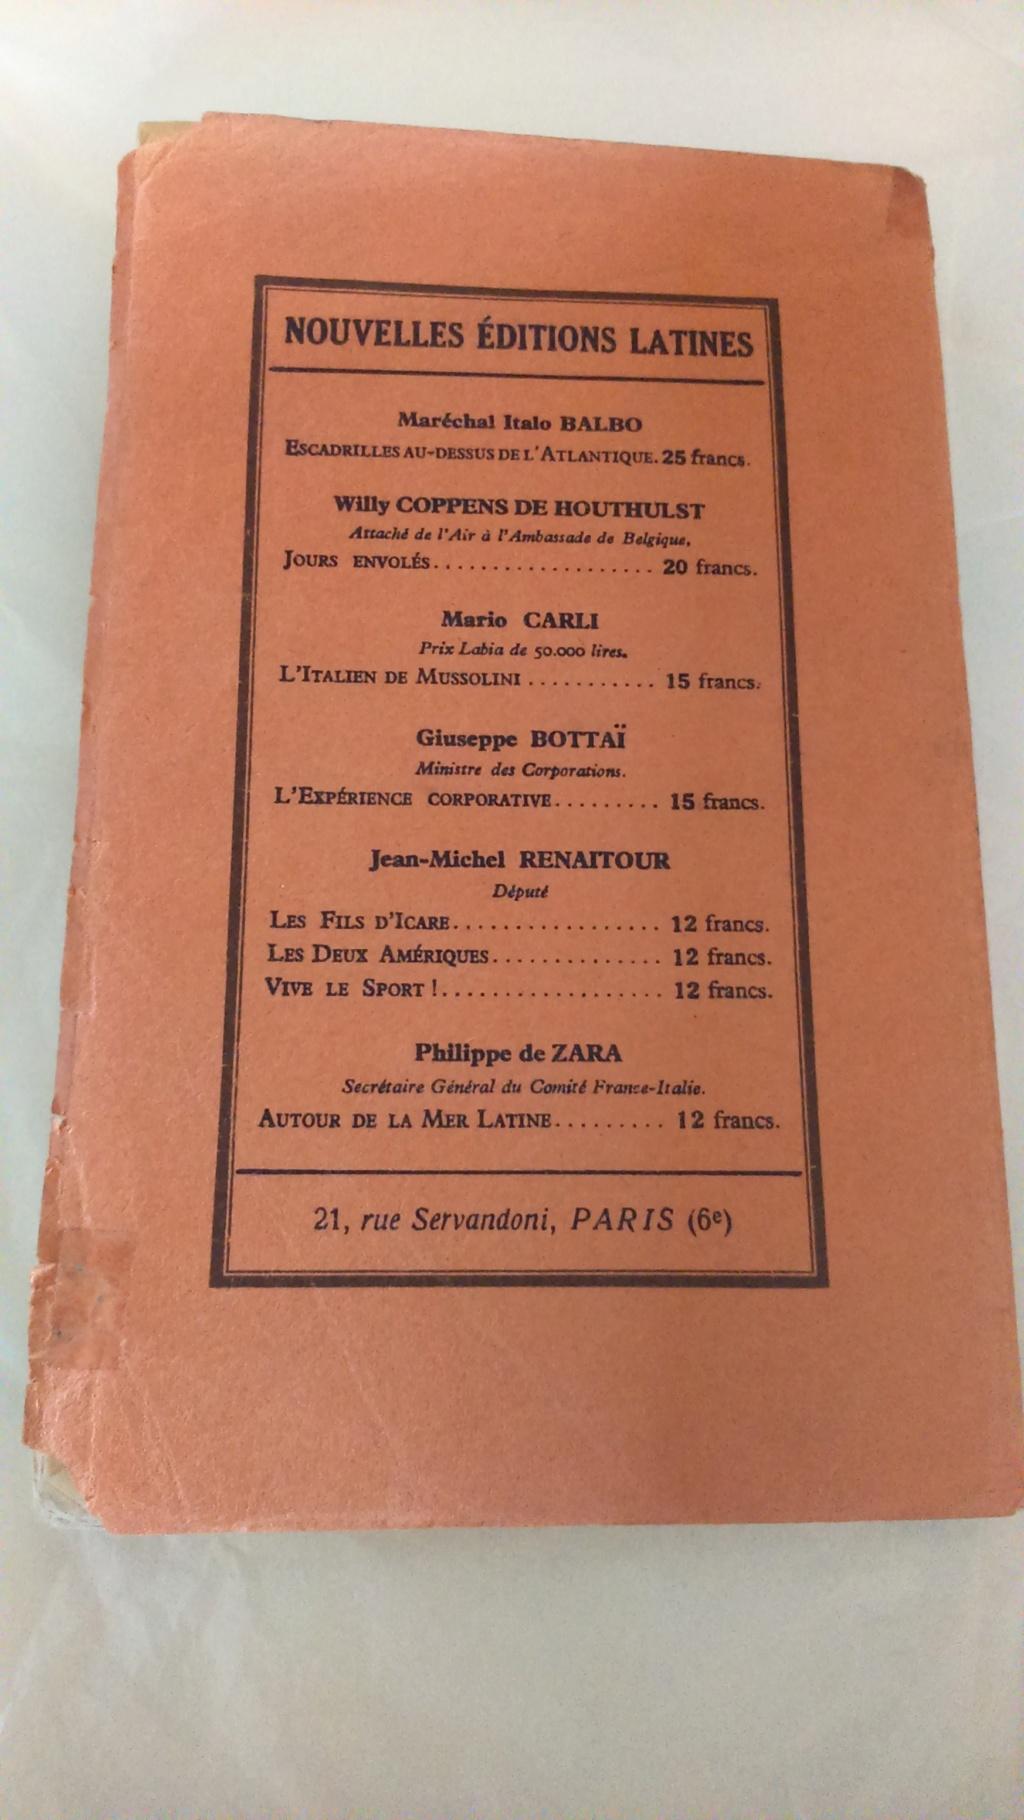 Mein Kampf  editions latines 1934   Dsc_0445